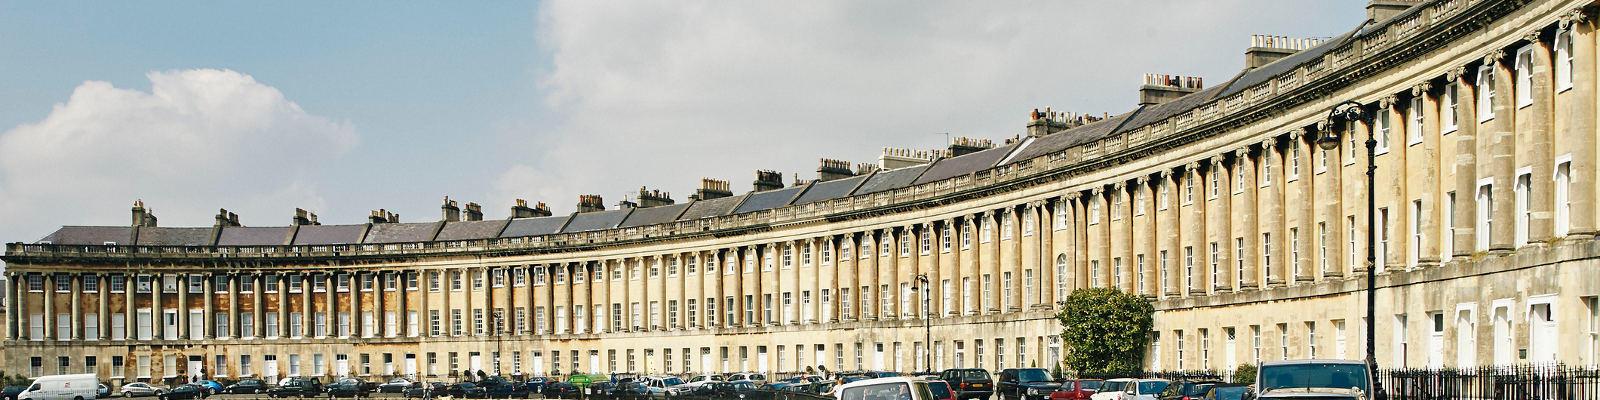 royal crescent bath england